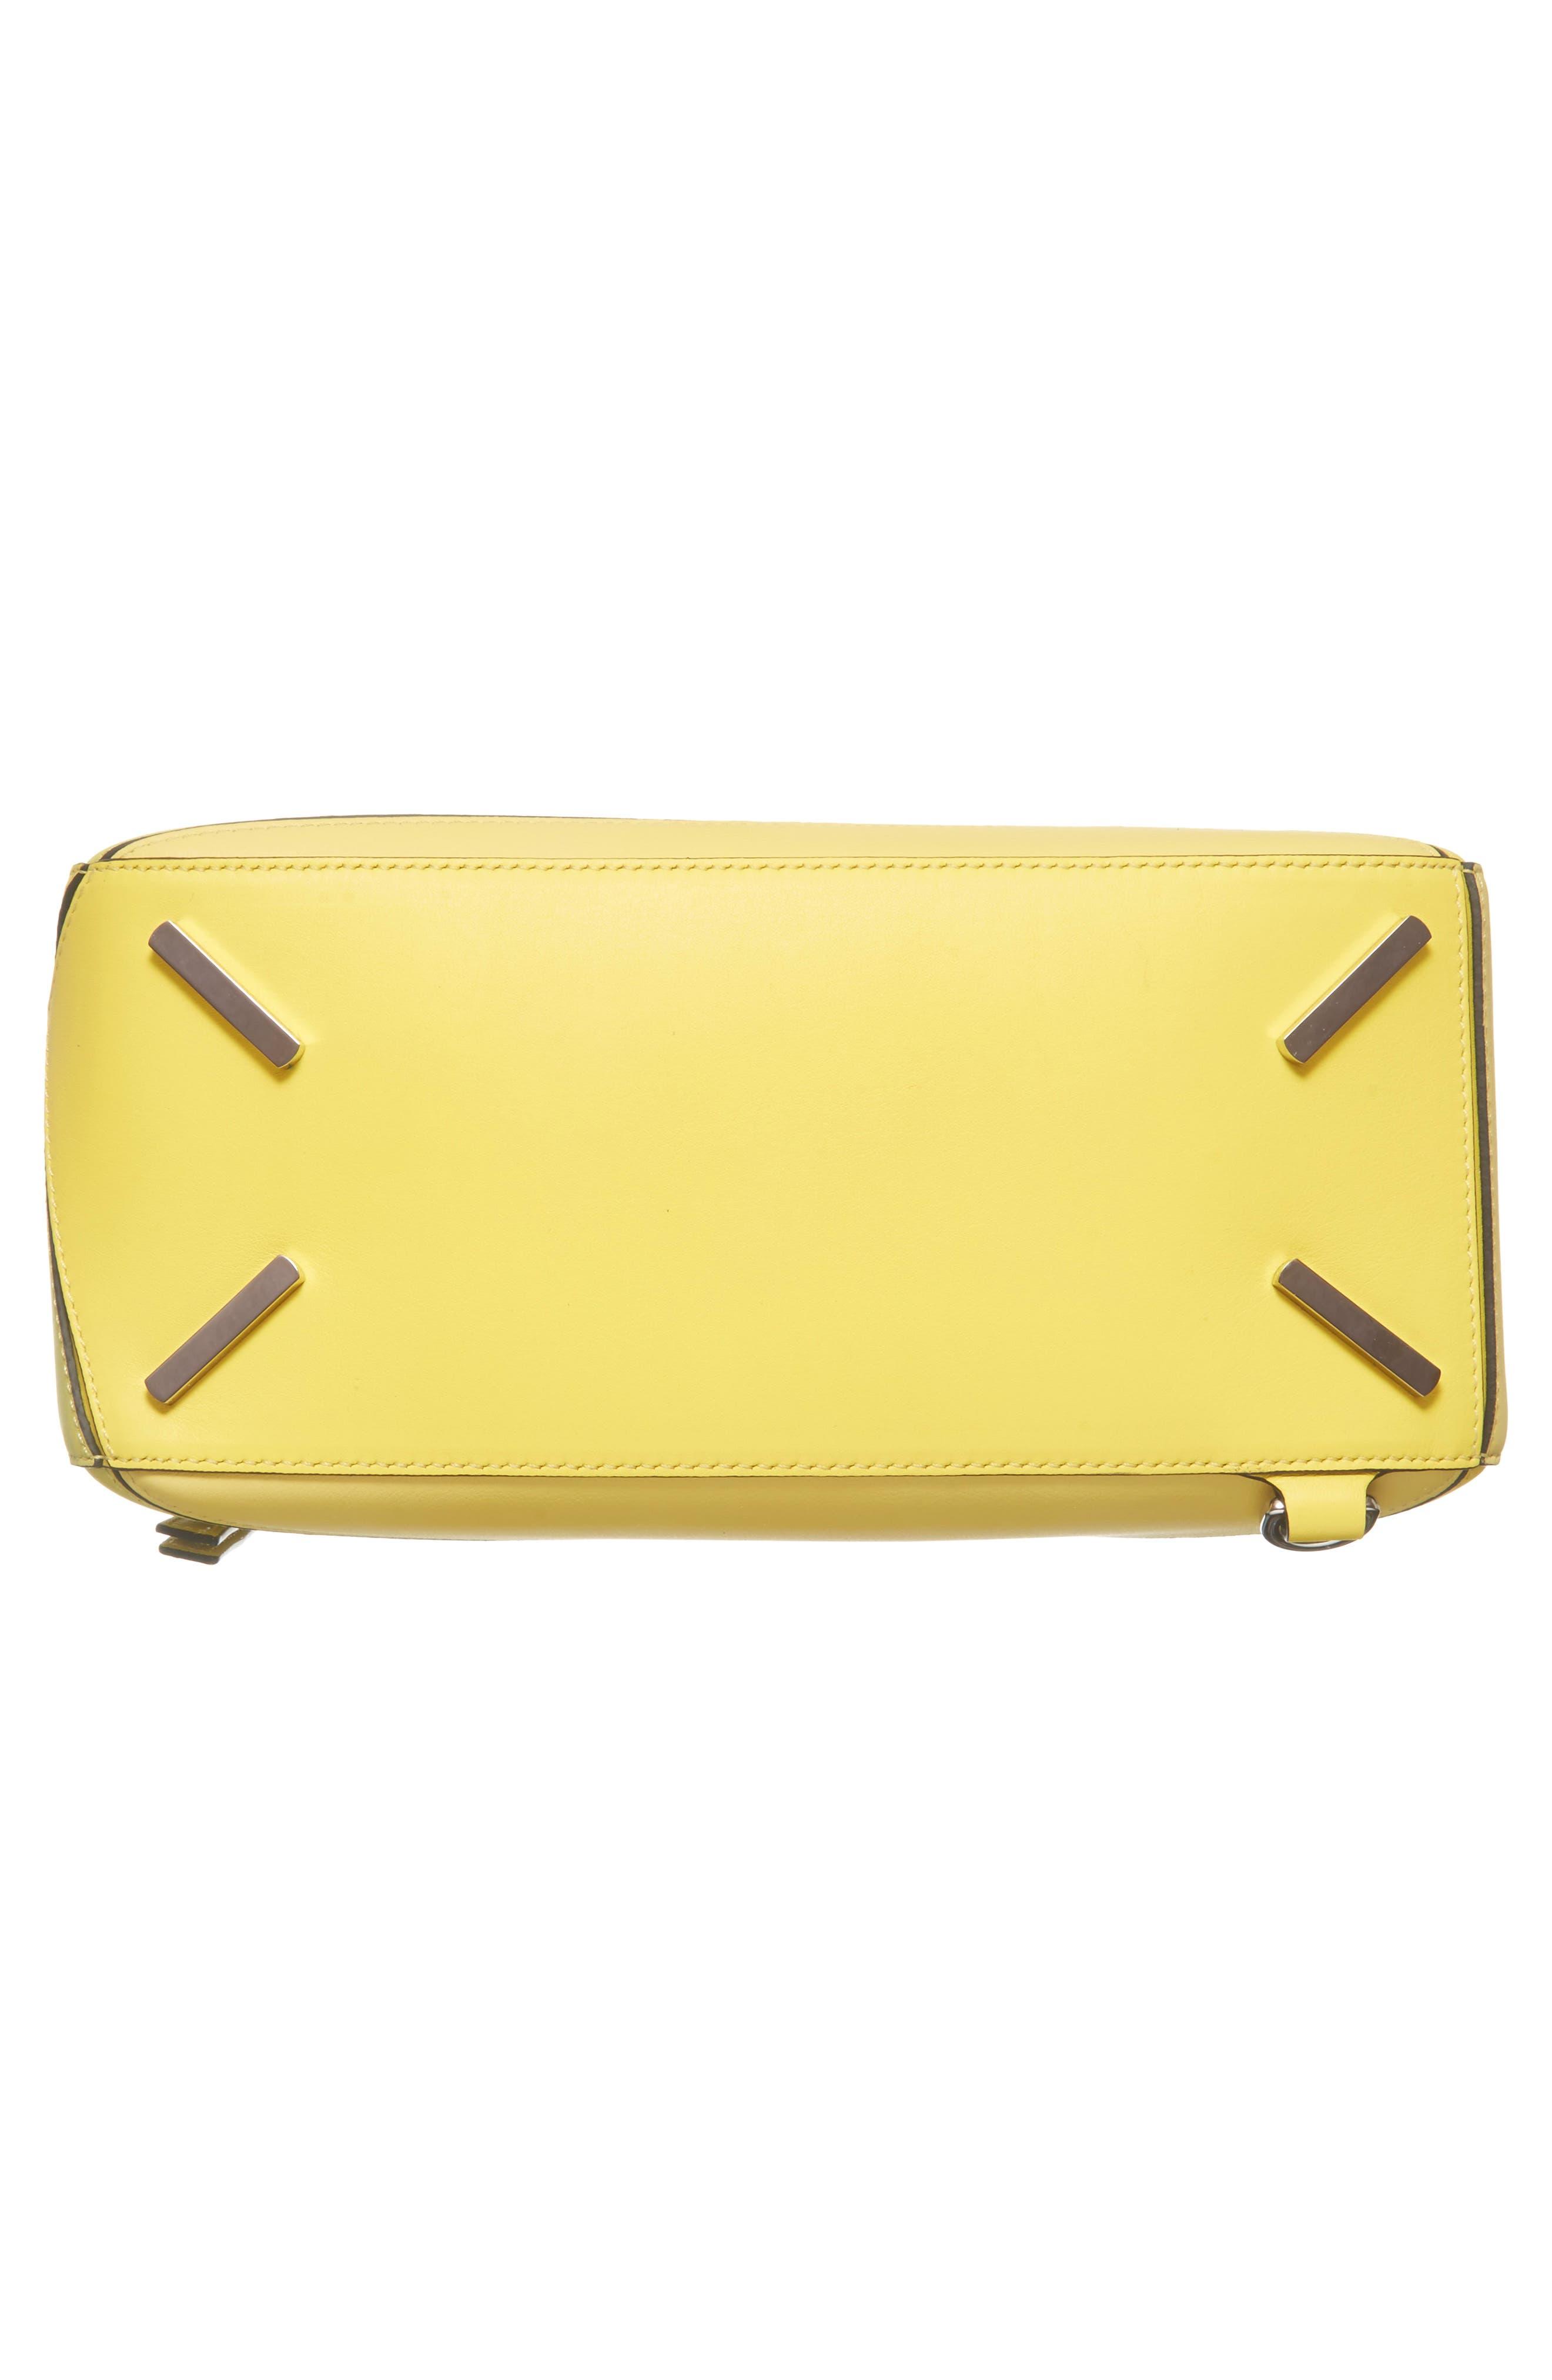 Medium Puzzle Calfskin Leather Shoulder Bag,                             Alternate thumbnail 7, color,                             Yellow Multitone